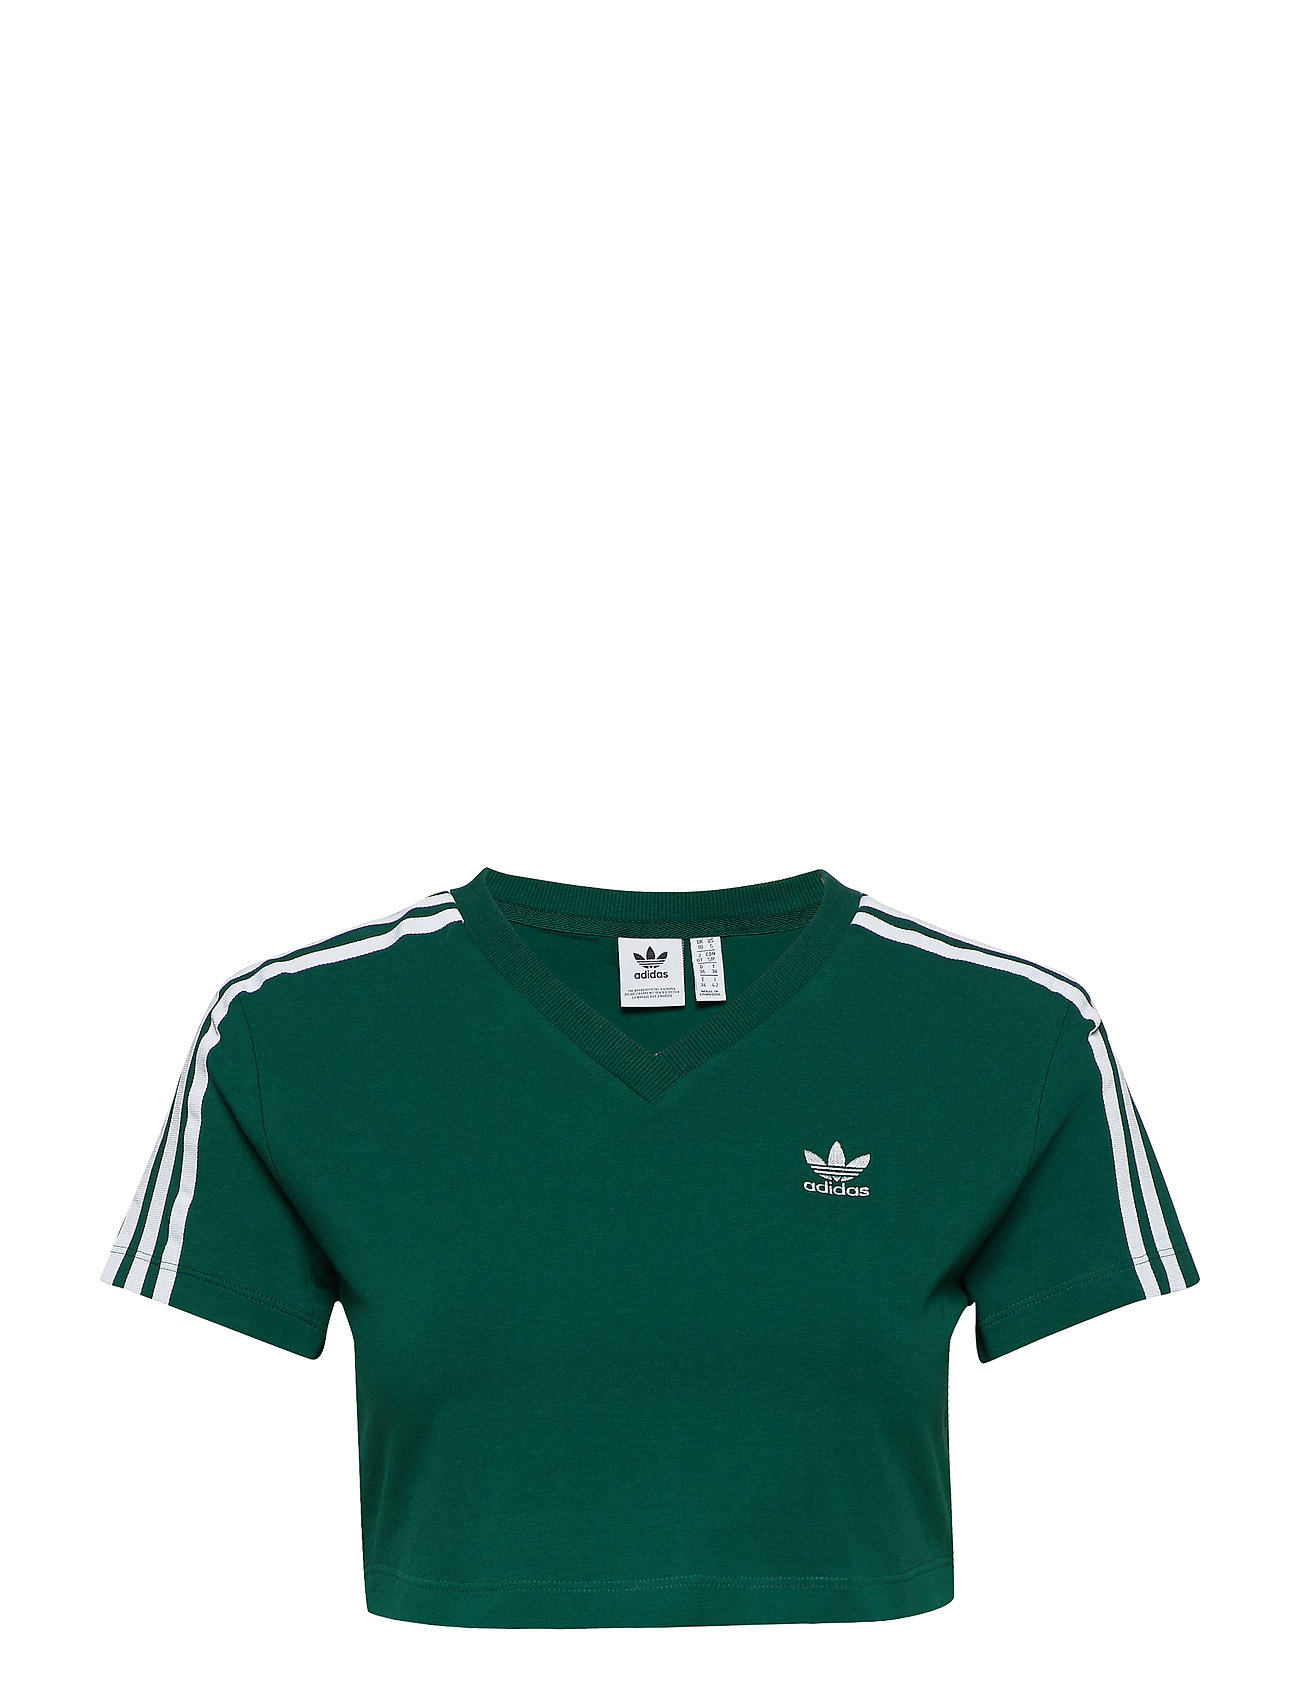 cgreen 29 Adidas Originals Cropped Tee 95 5qwEEgF